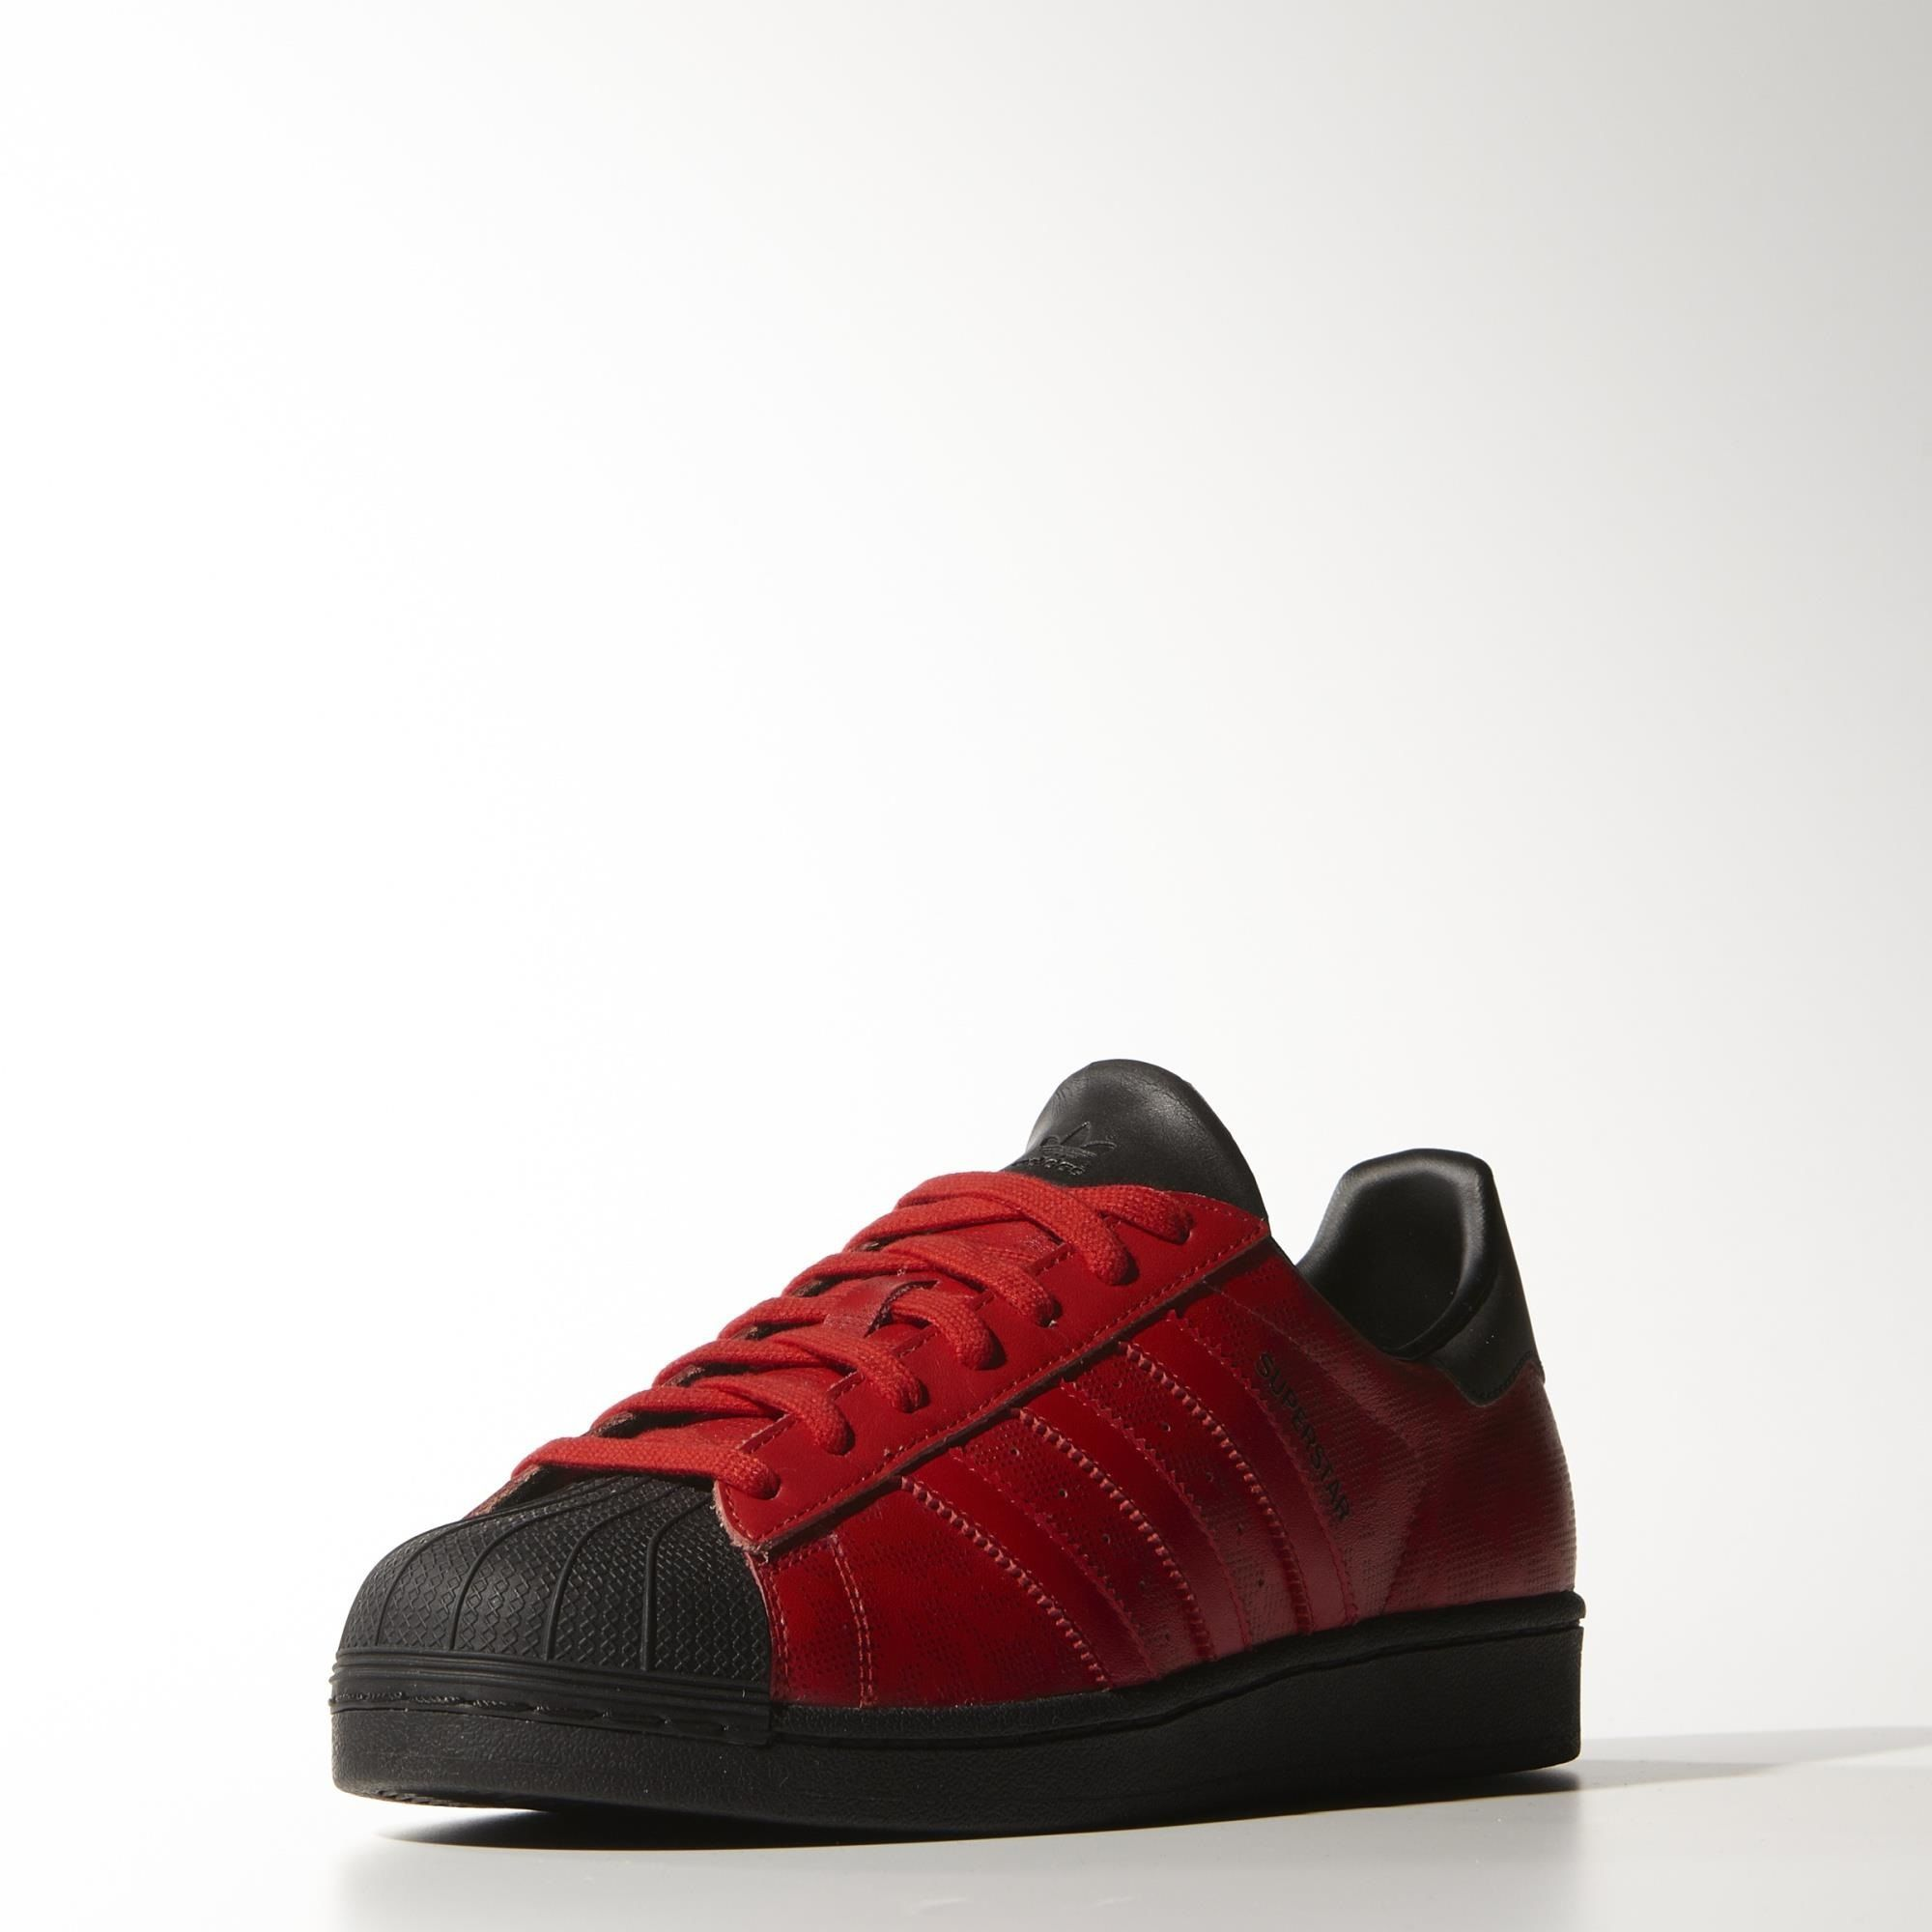 on sale 6e8b1 b1b34 adidas - Superstar Camo 15 Shoes